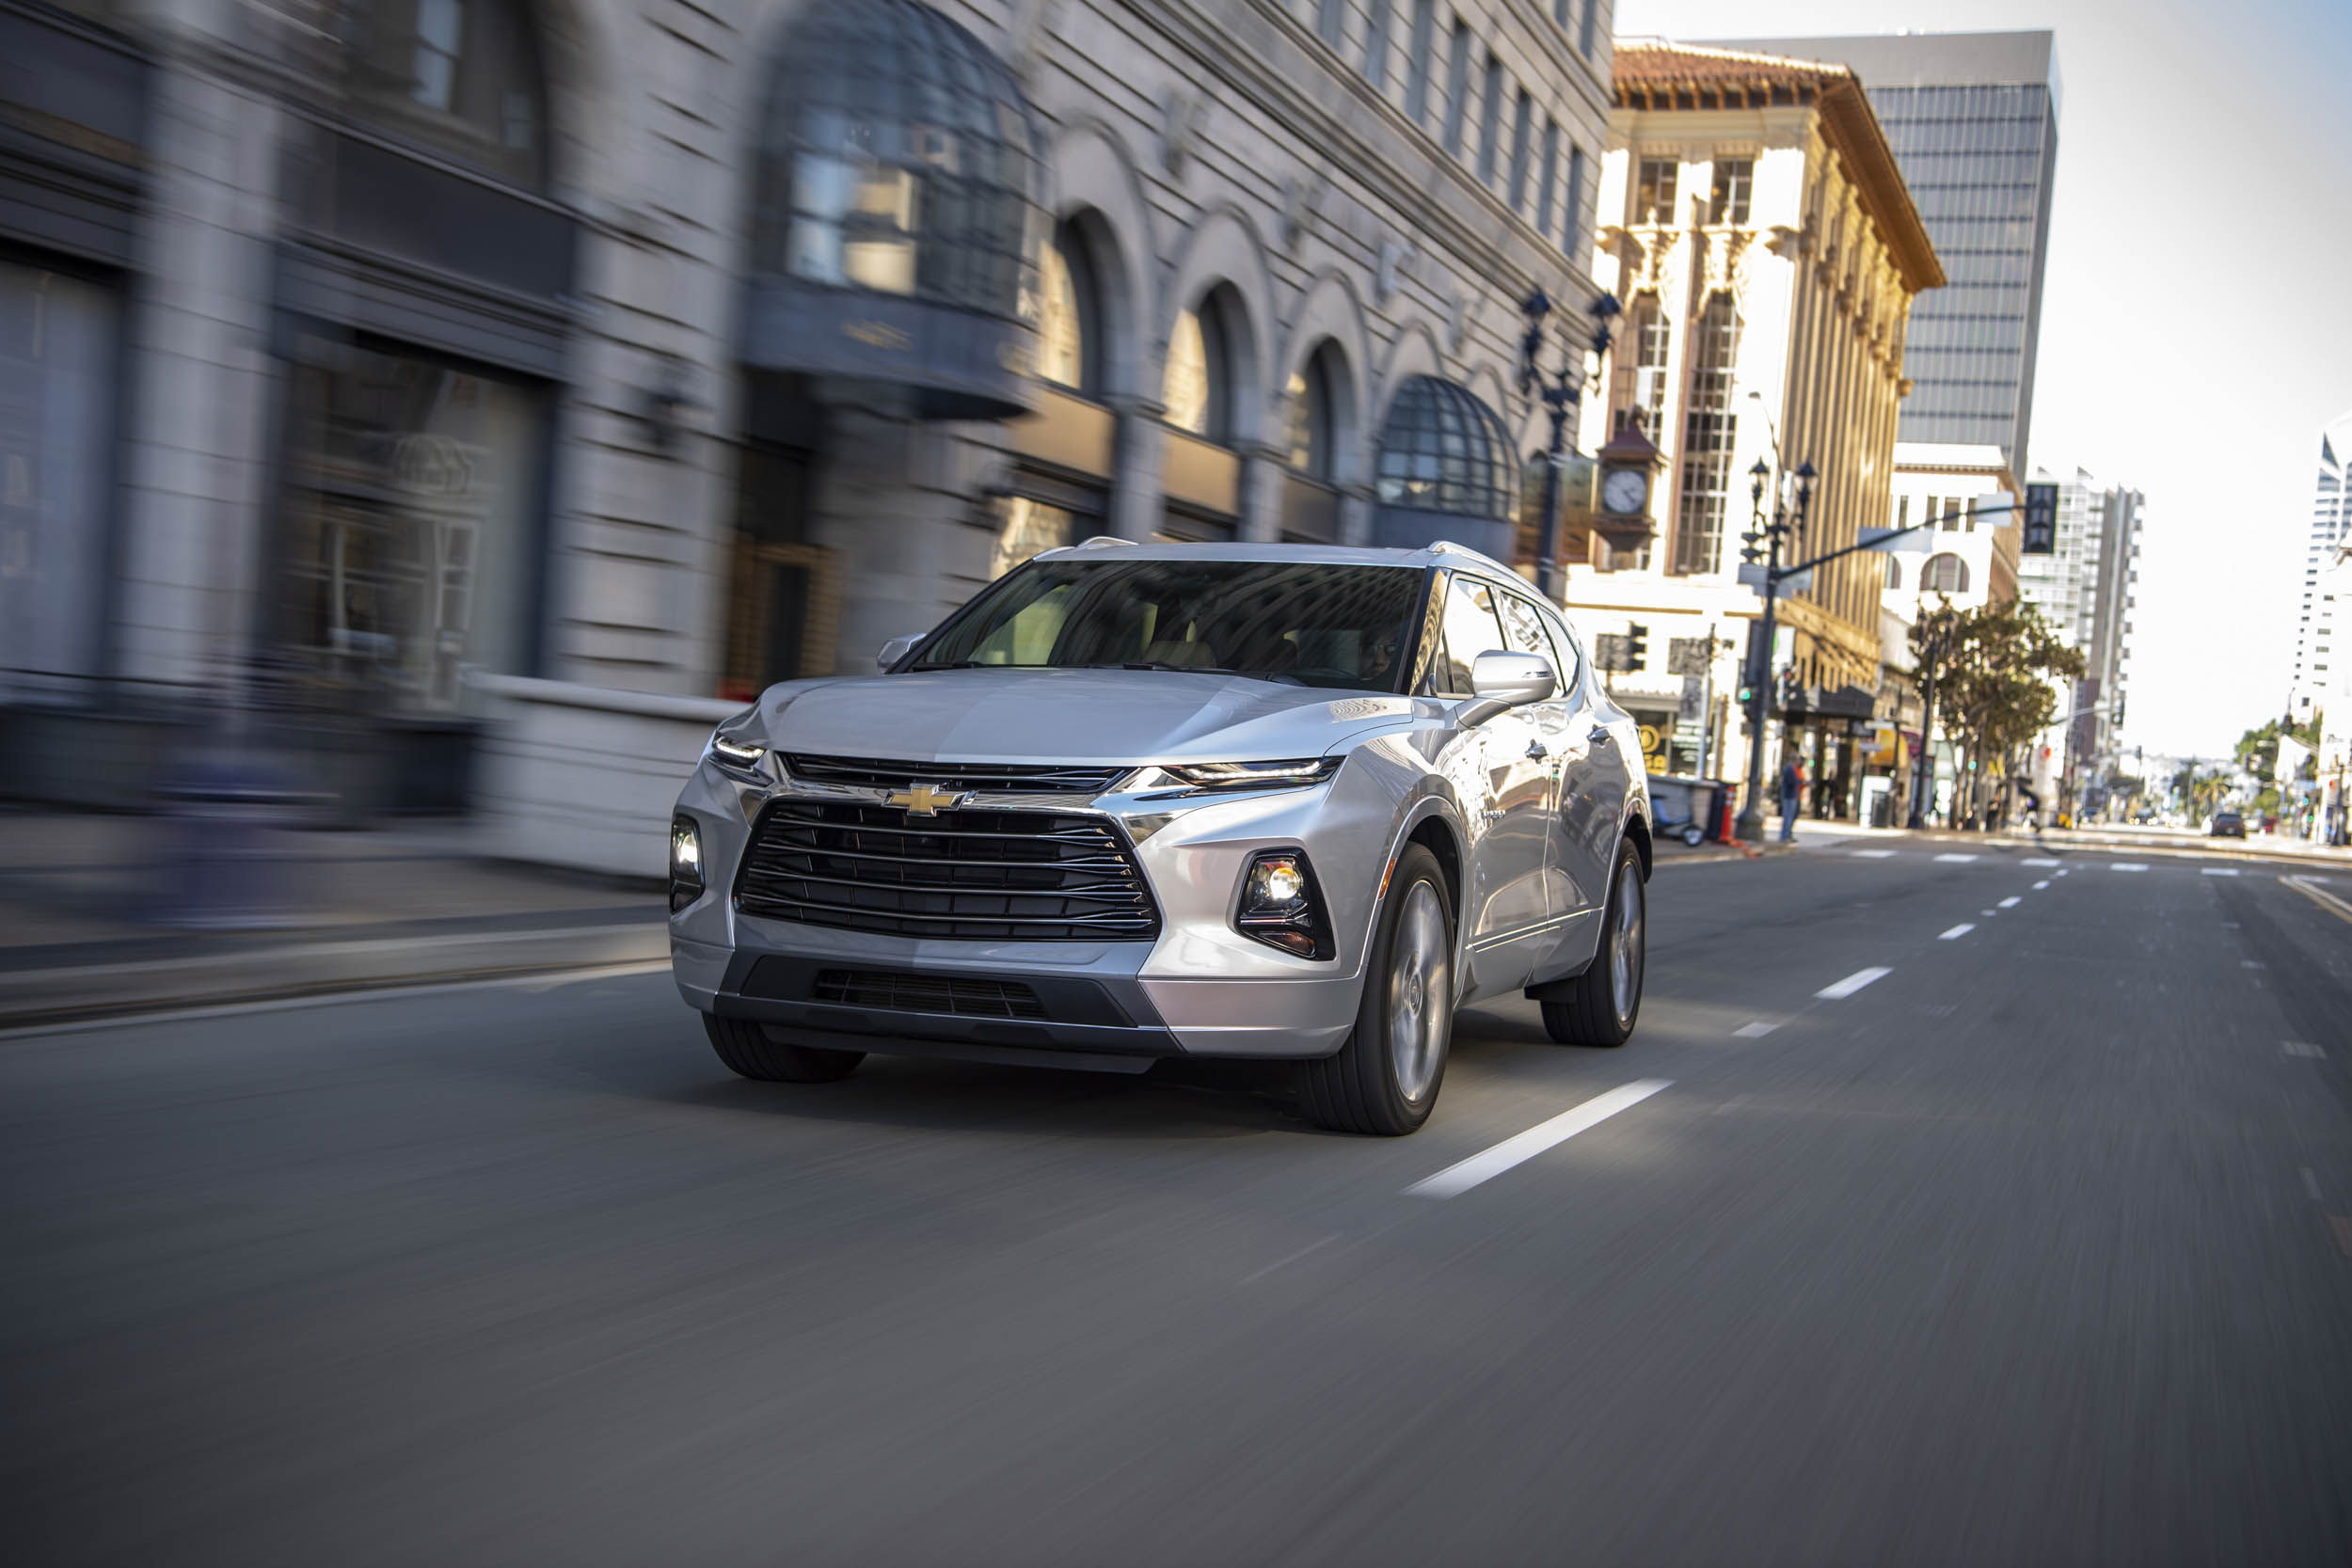 2019 Chevrolet Blazer front 3/4 driving